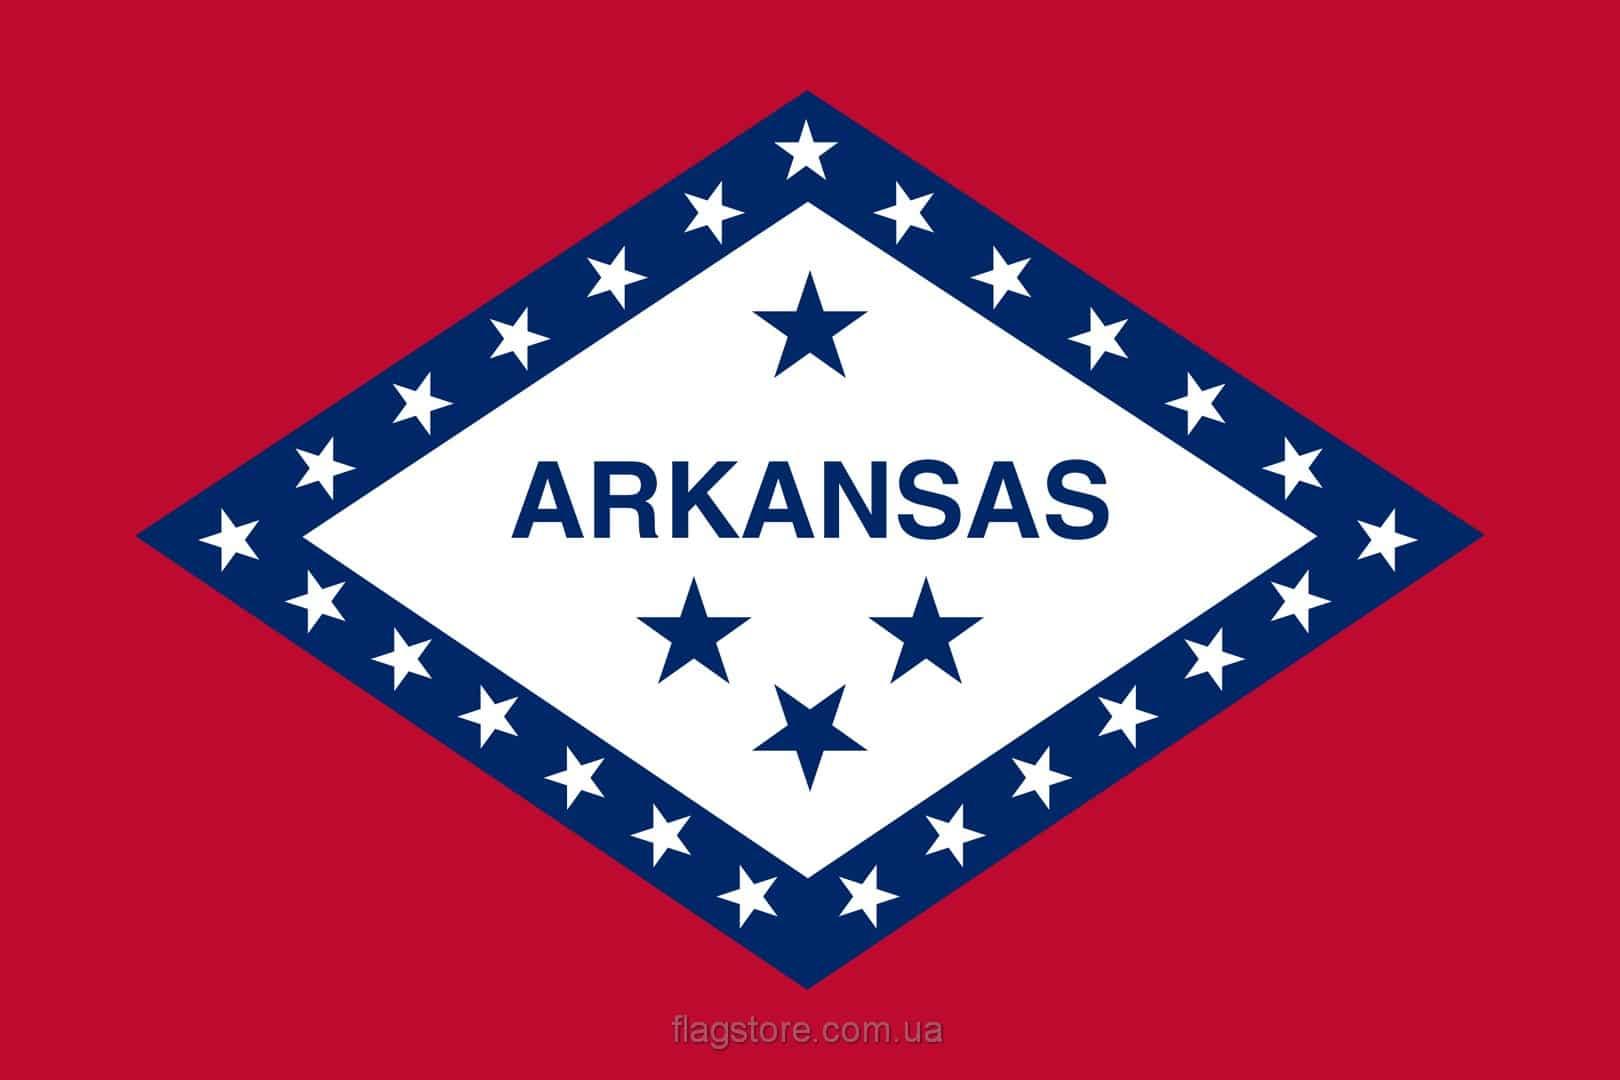 Купить флаг Арканзаса (штата Арканзас)